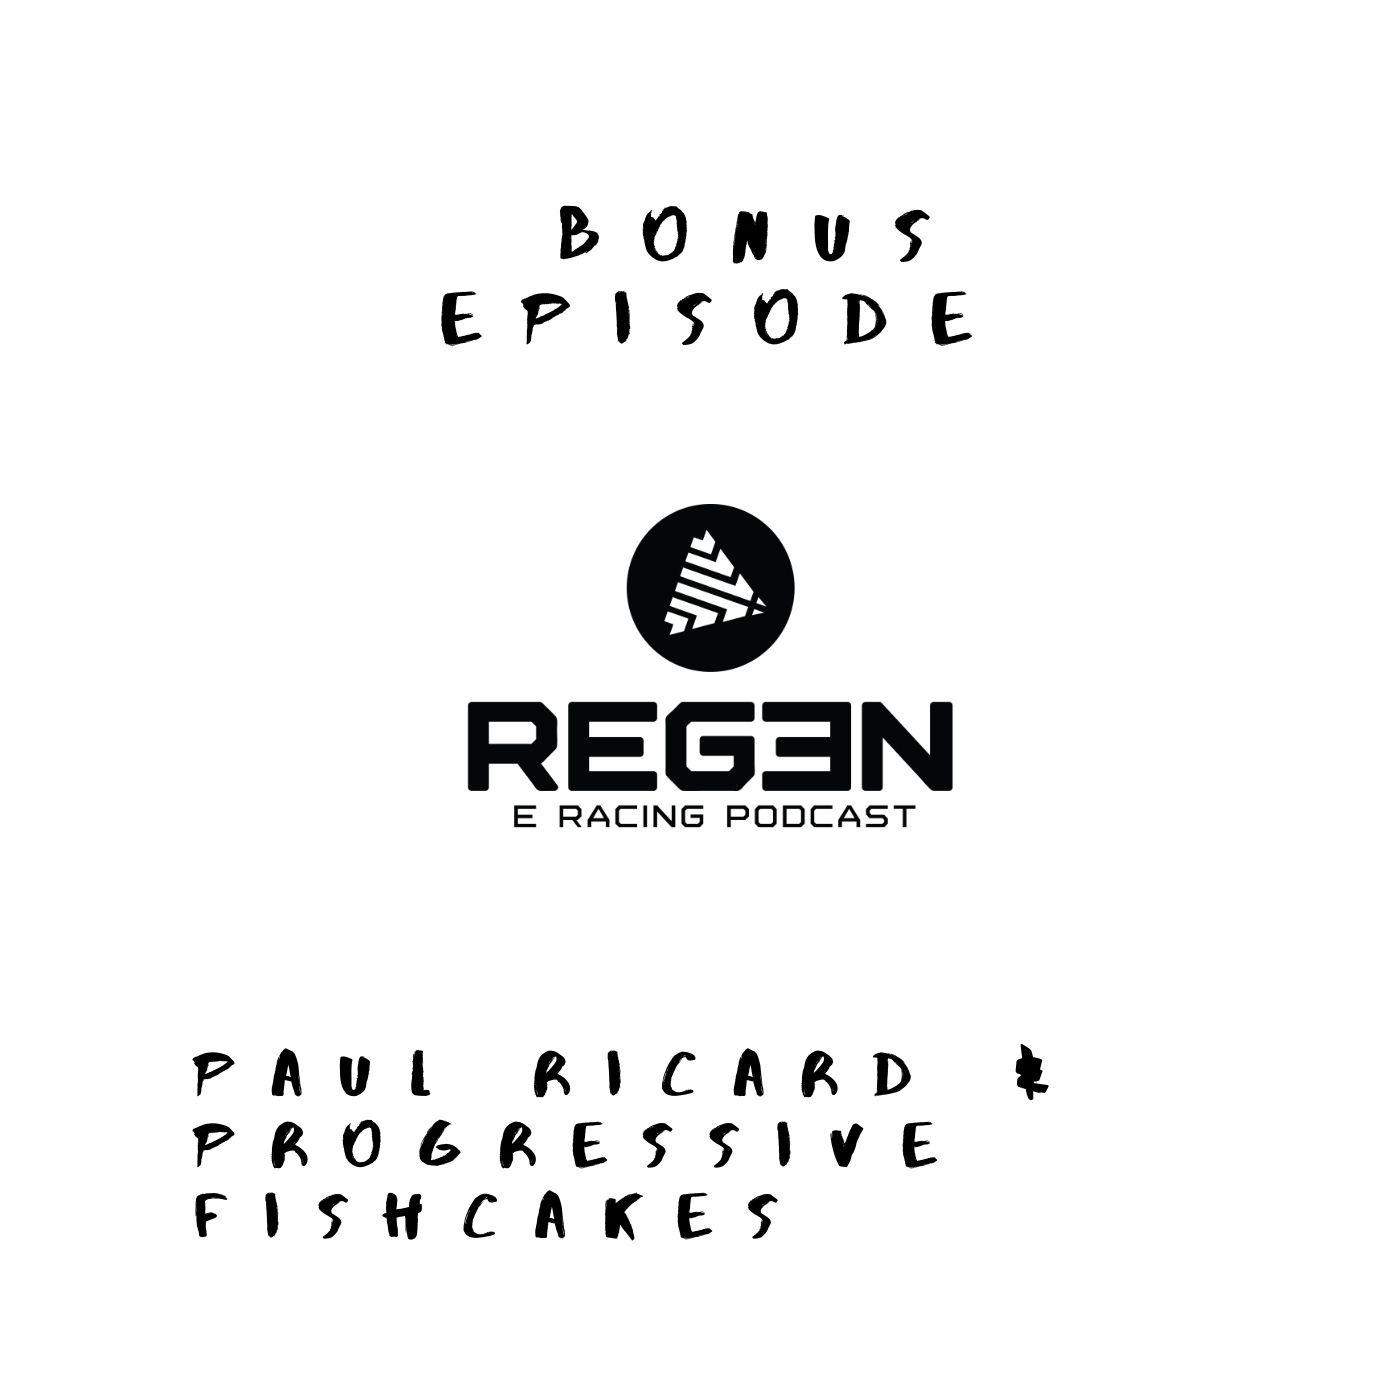 Paul Ricard & Progressive Fishcakes